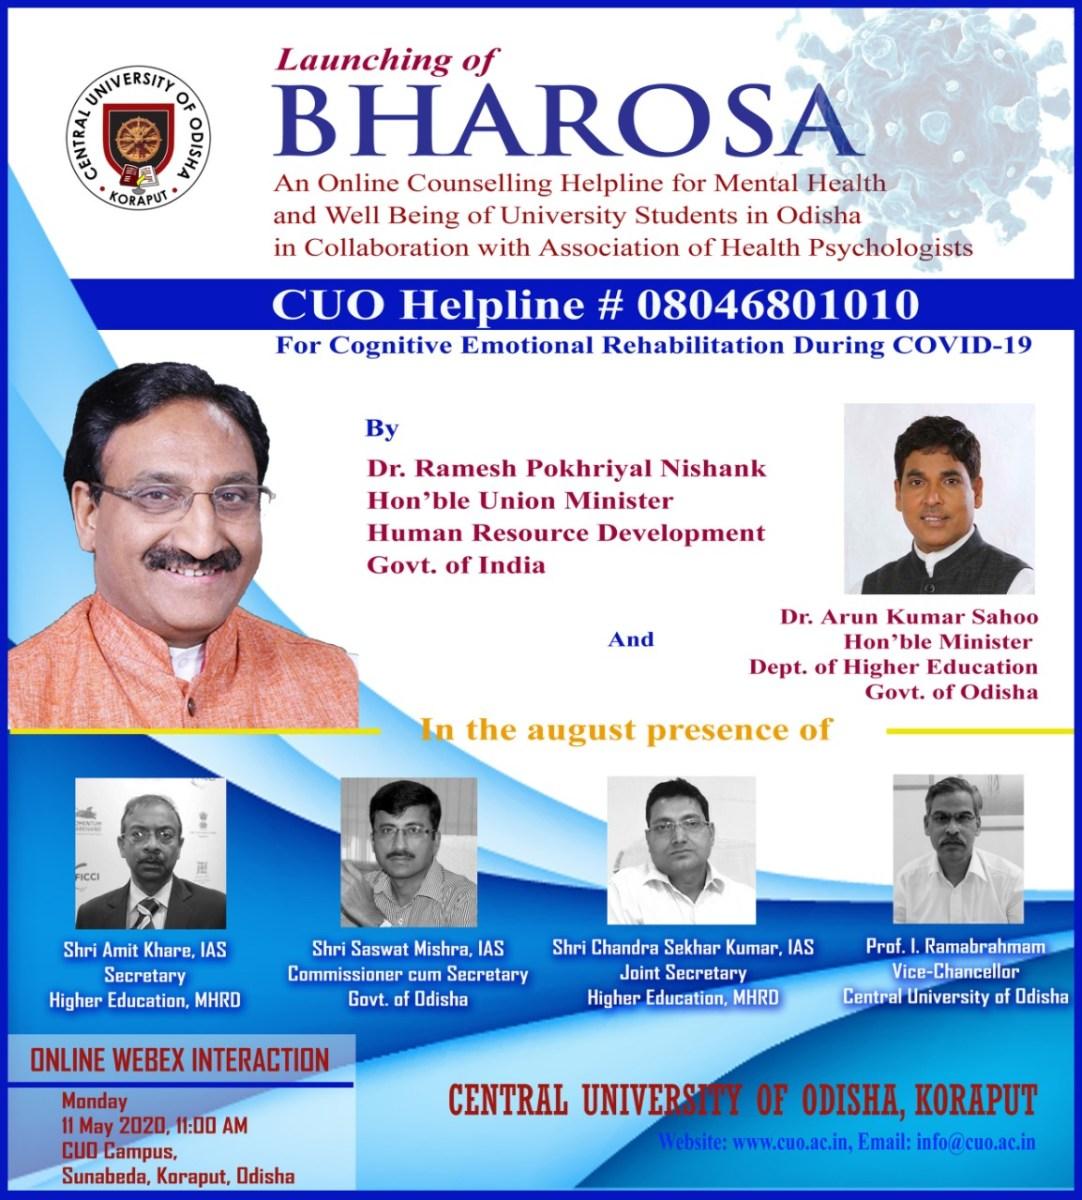 Central University Of Karnataka: HRD Minister Dr RP Nishank To Launch 'BHAROSA', An Online